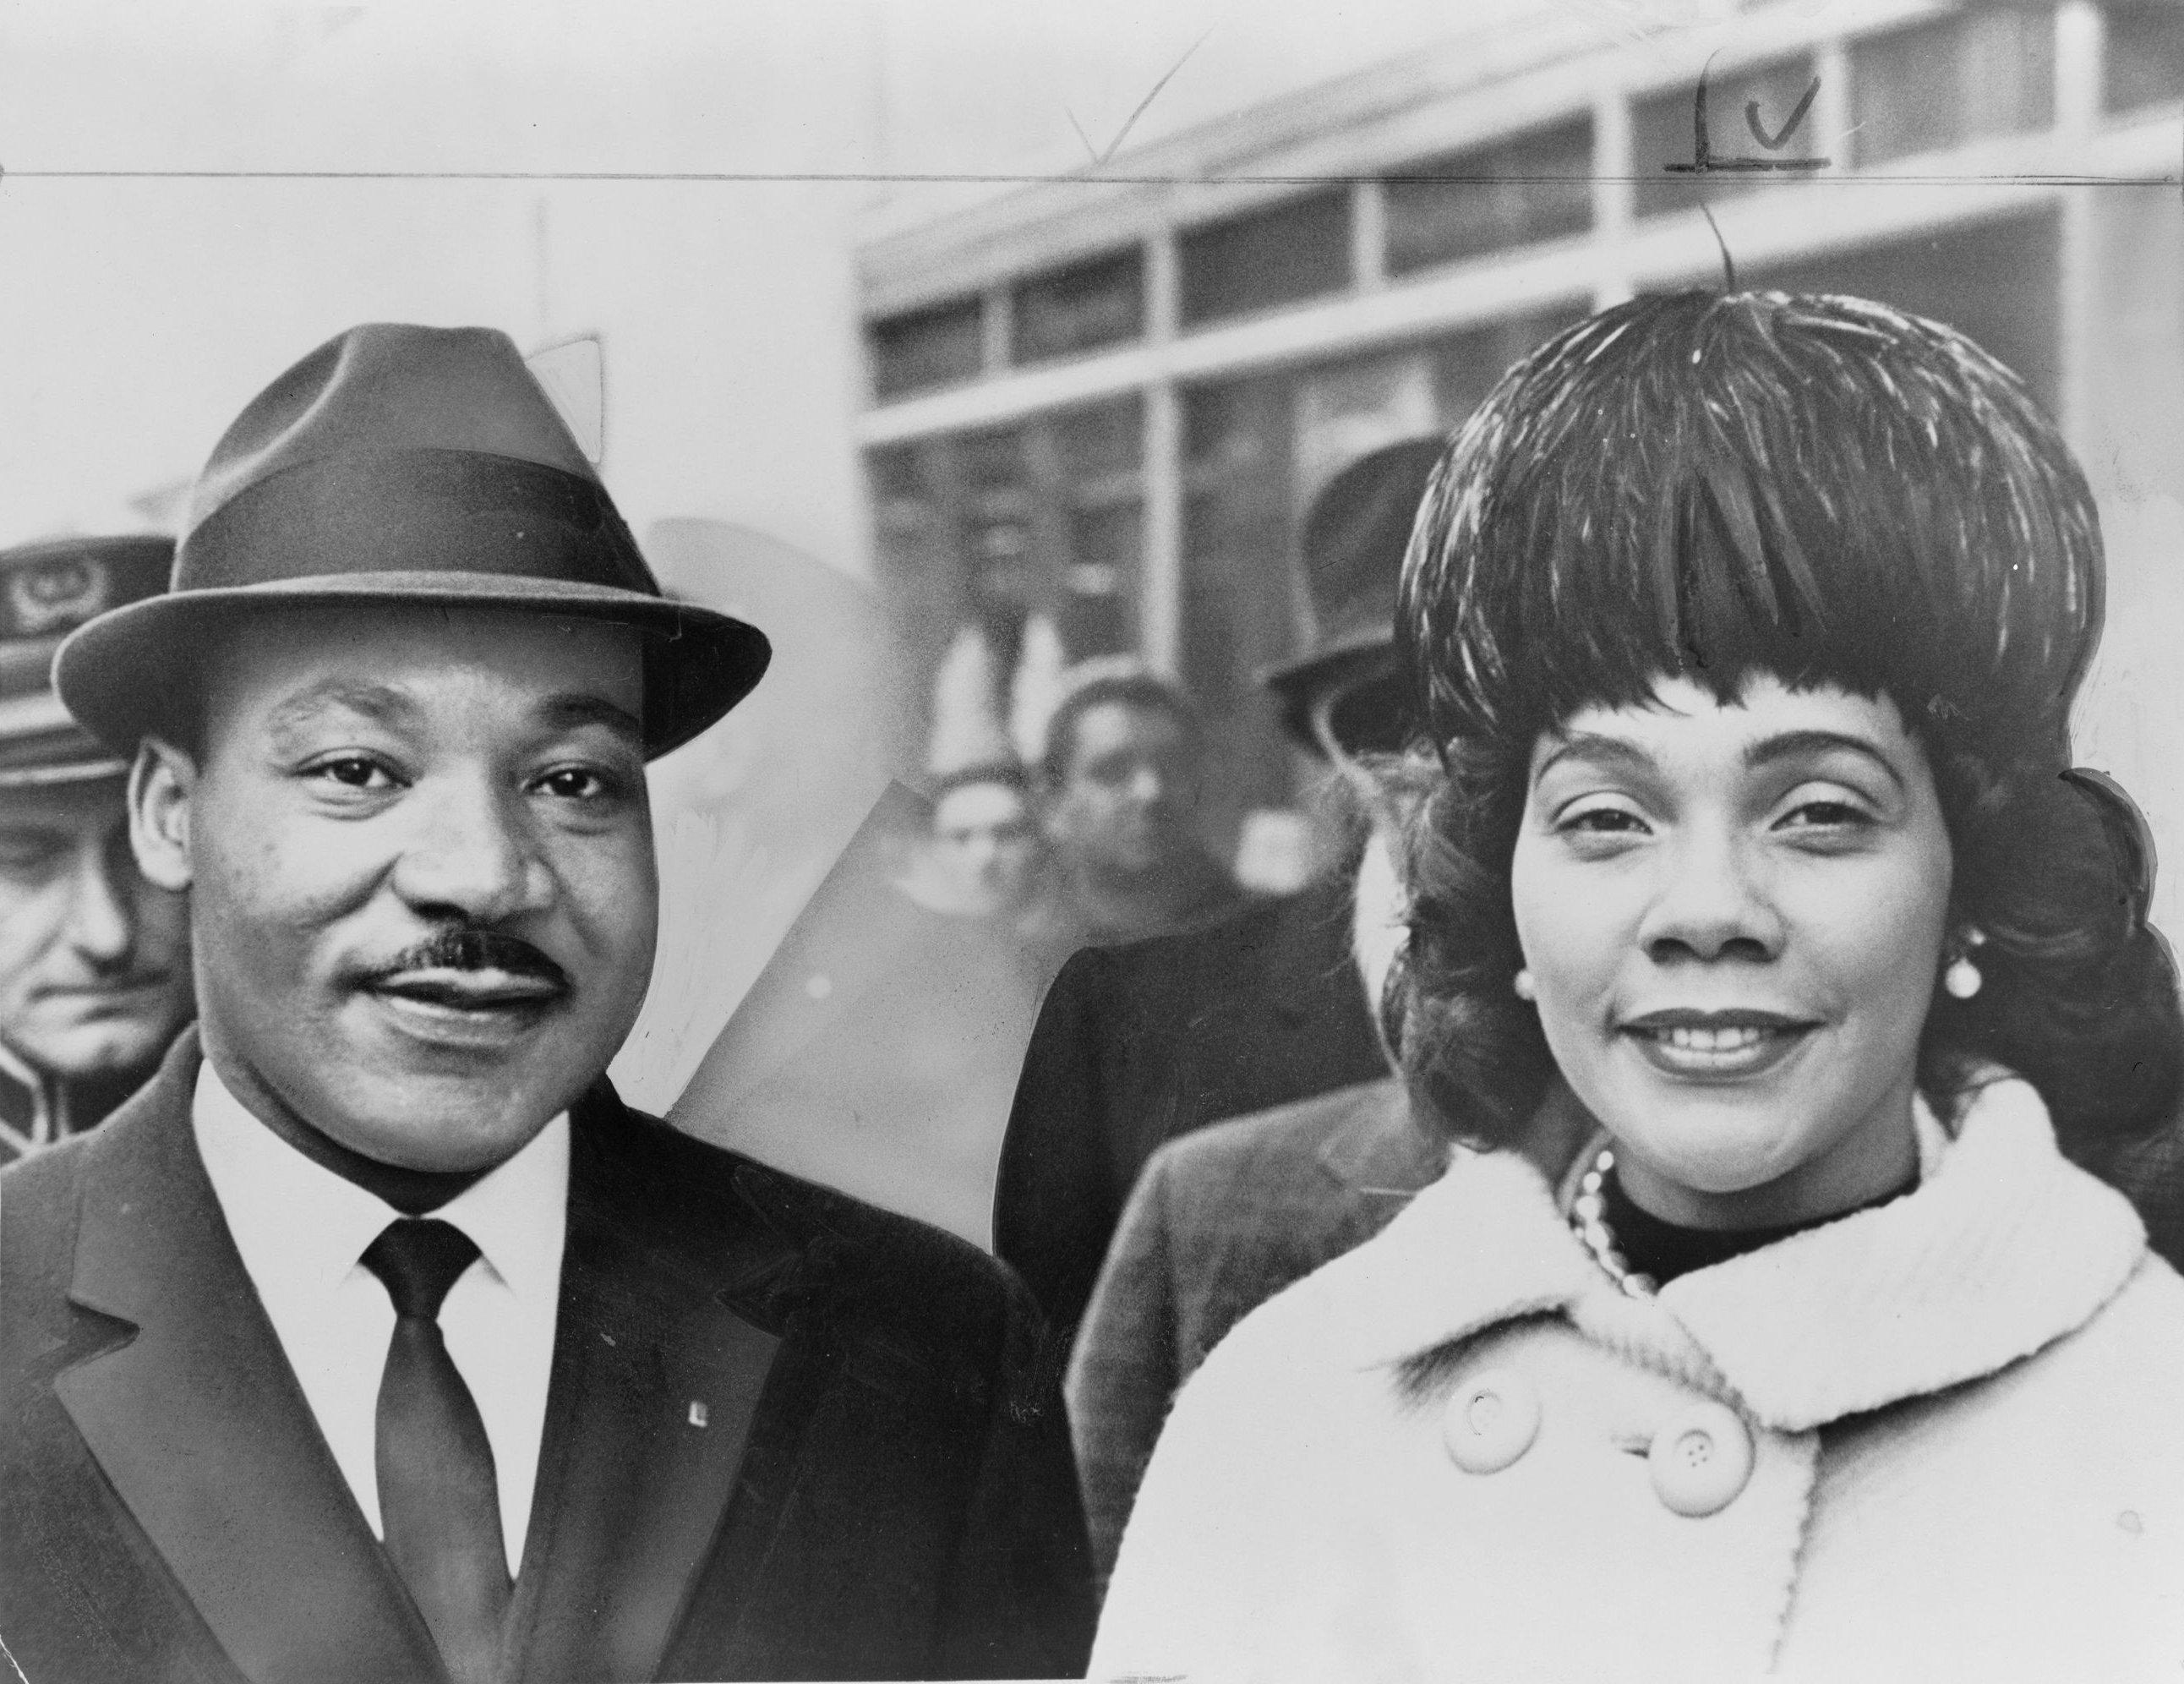 Martin_Luther_King_Jr_zumic-spotify-playlist